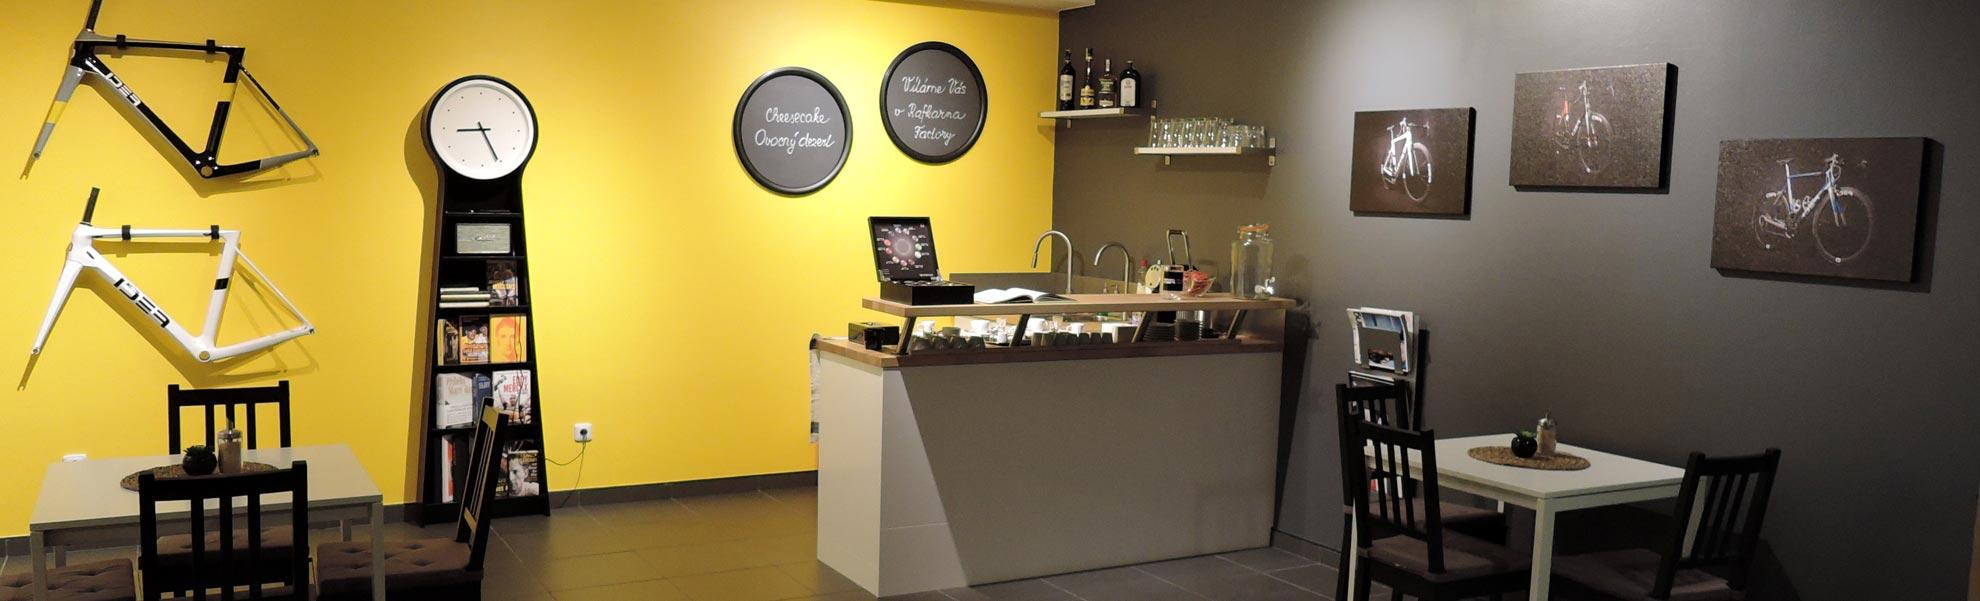 cabecera cafe